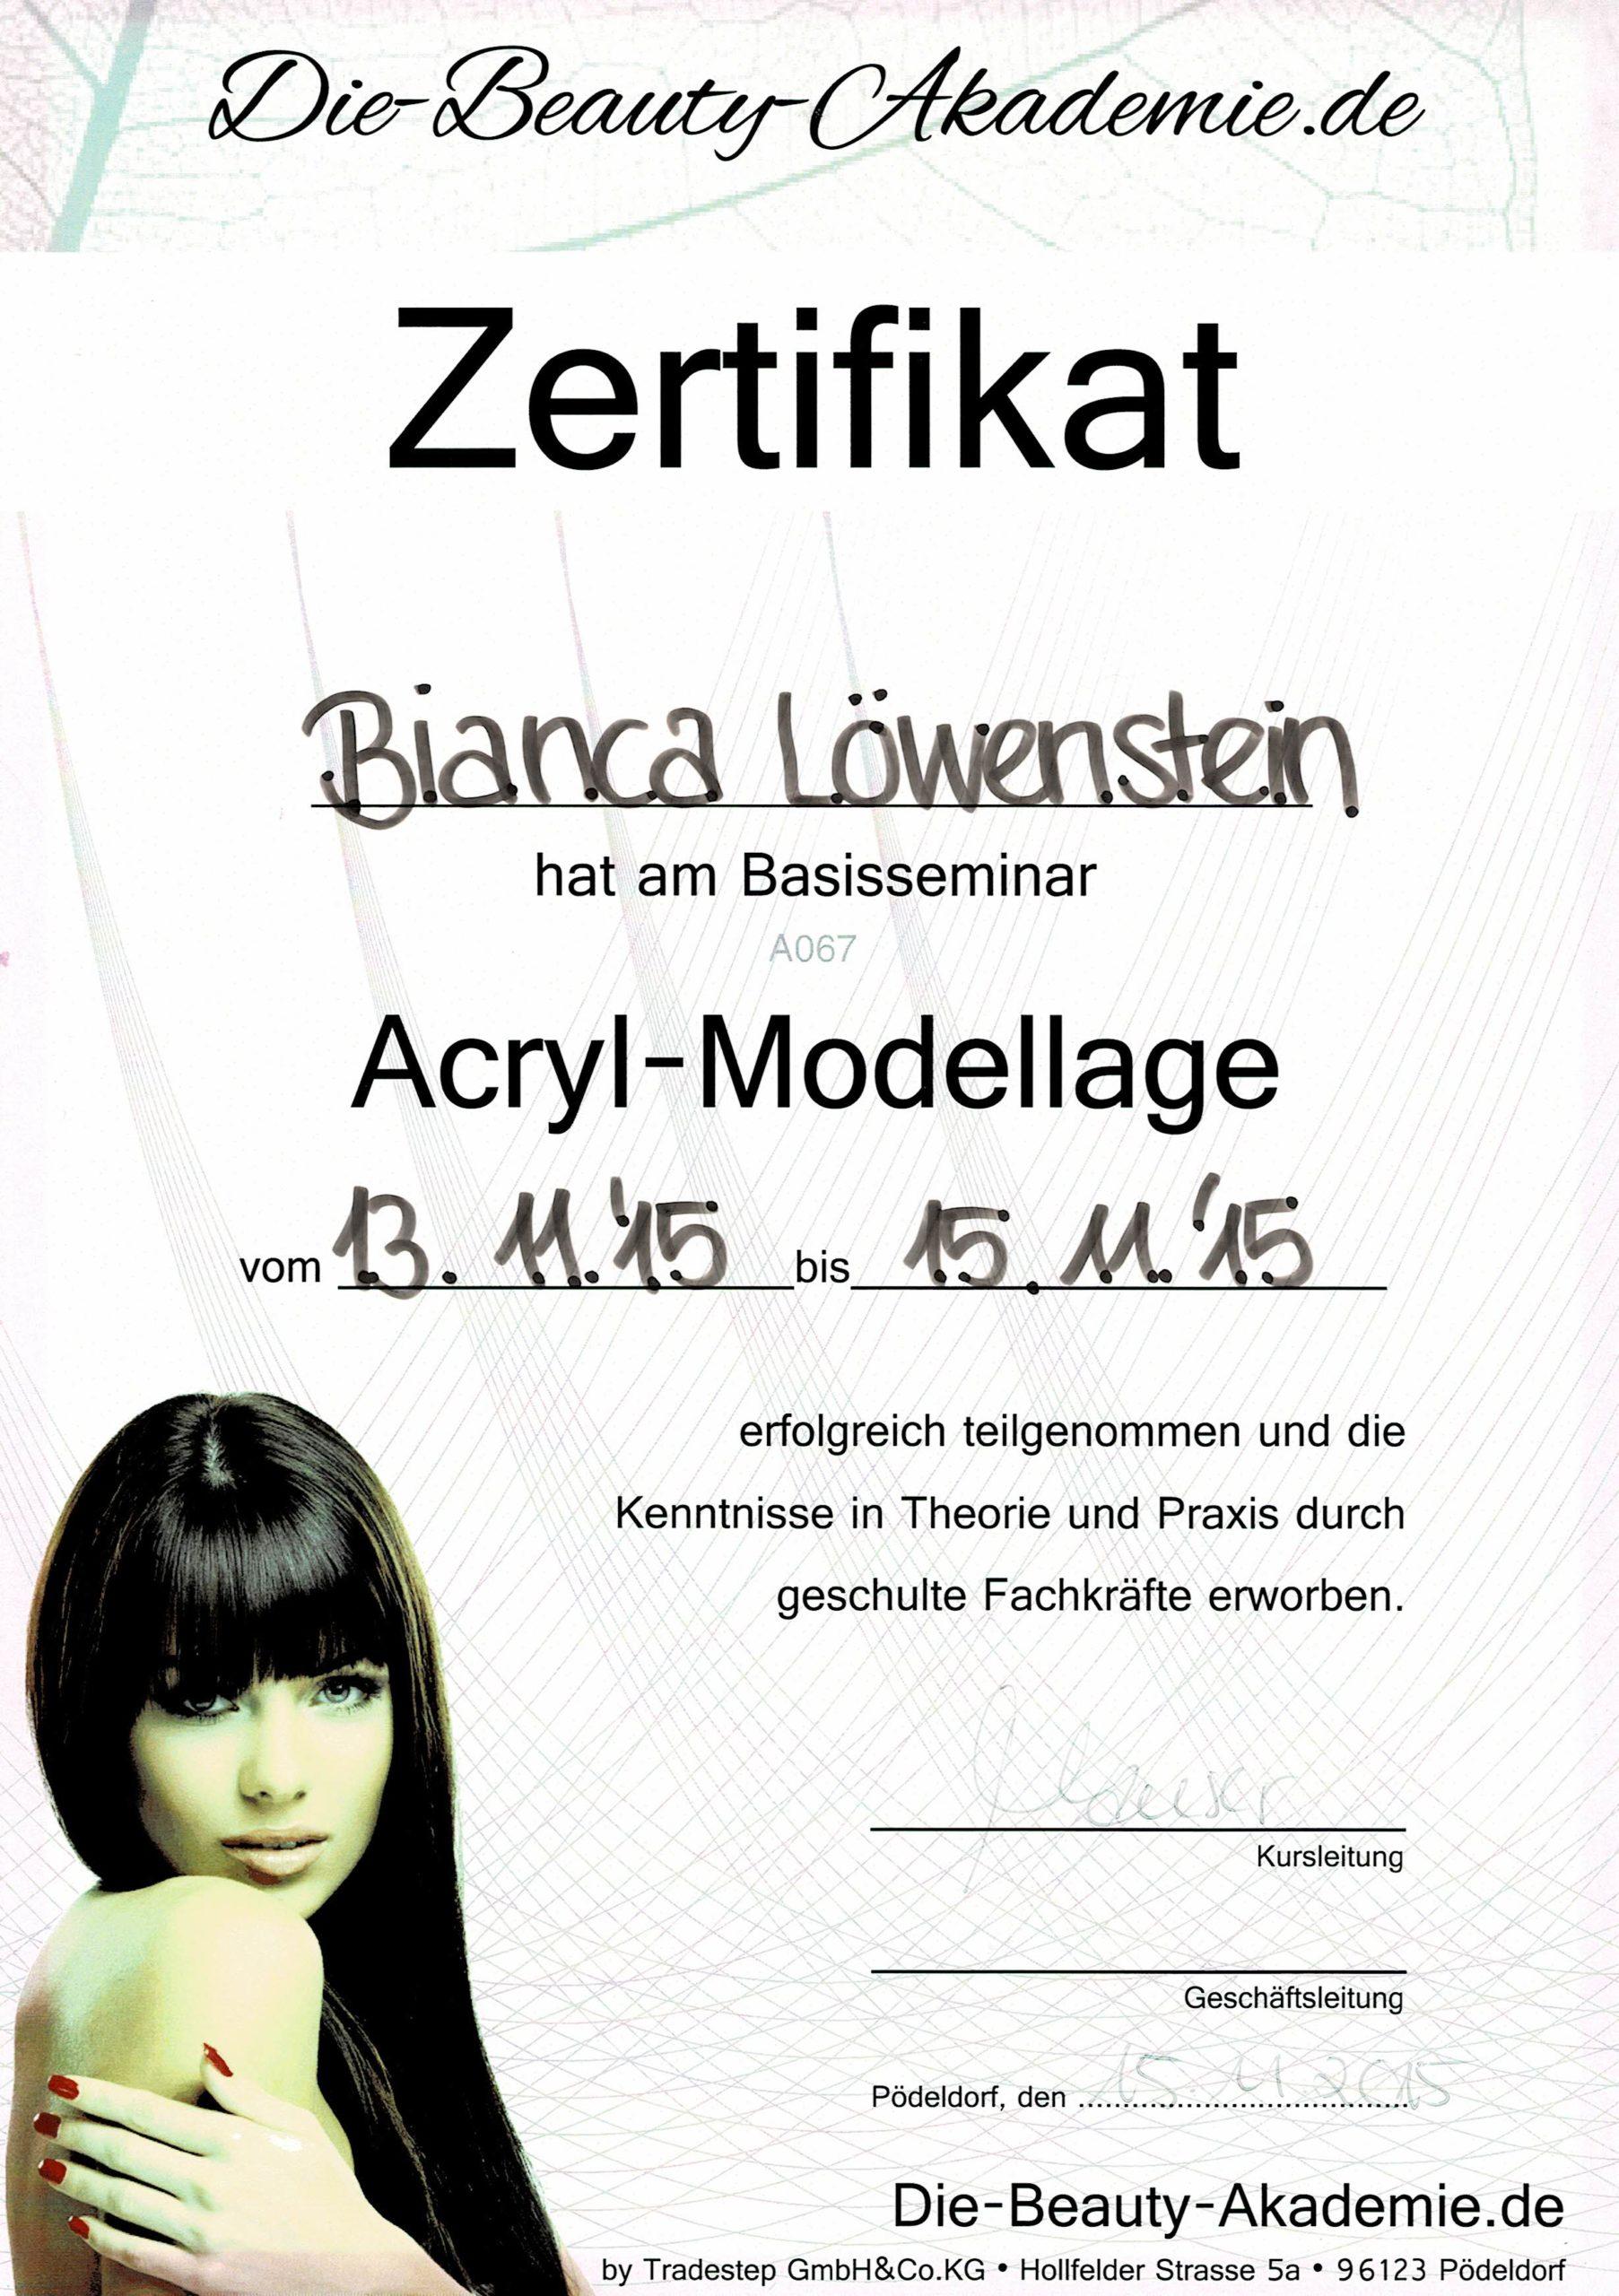 Zertifikat der Beauty Akademie für Acryl-Modellage